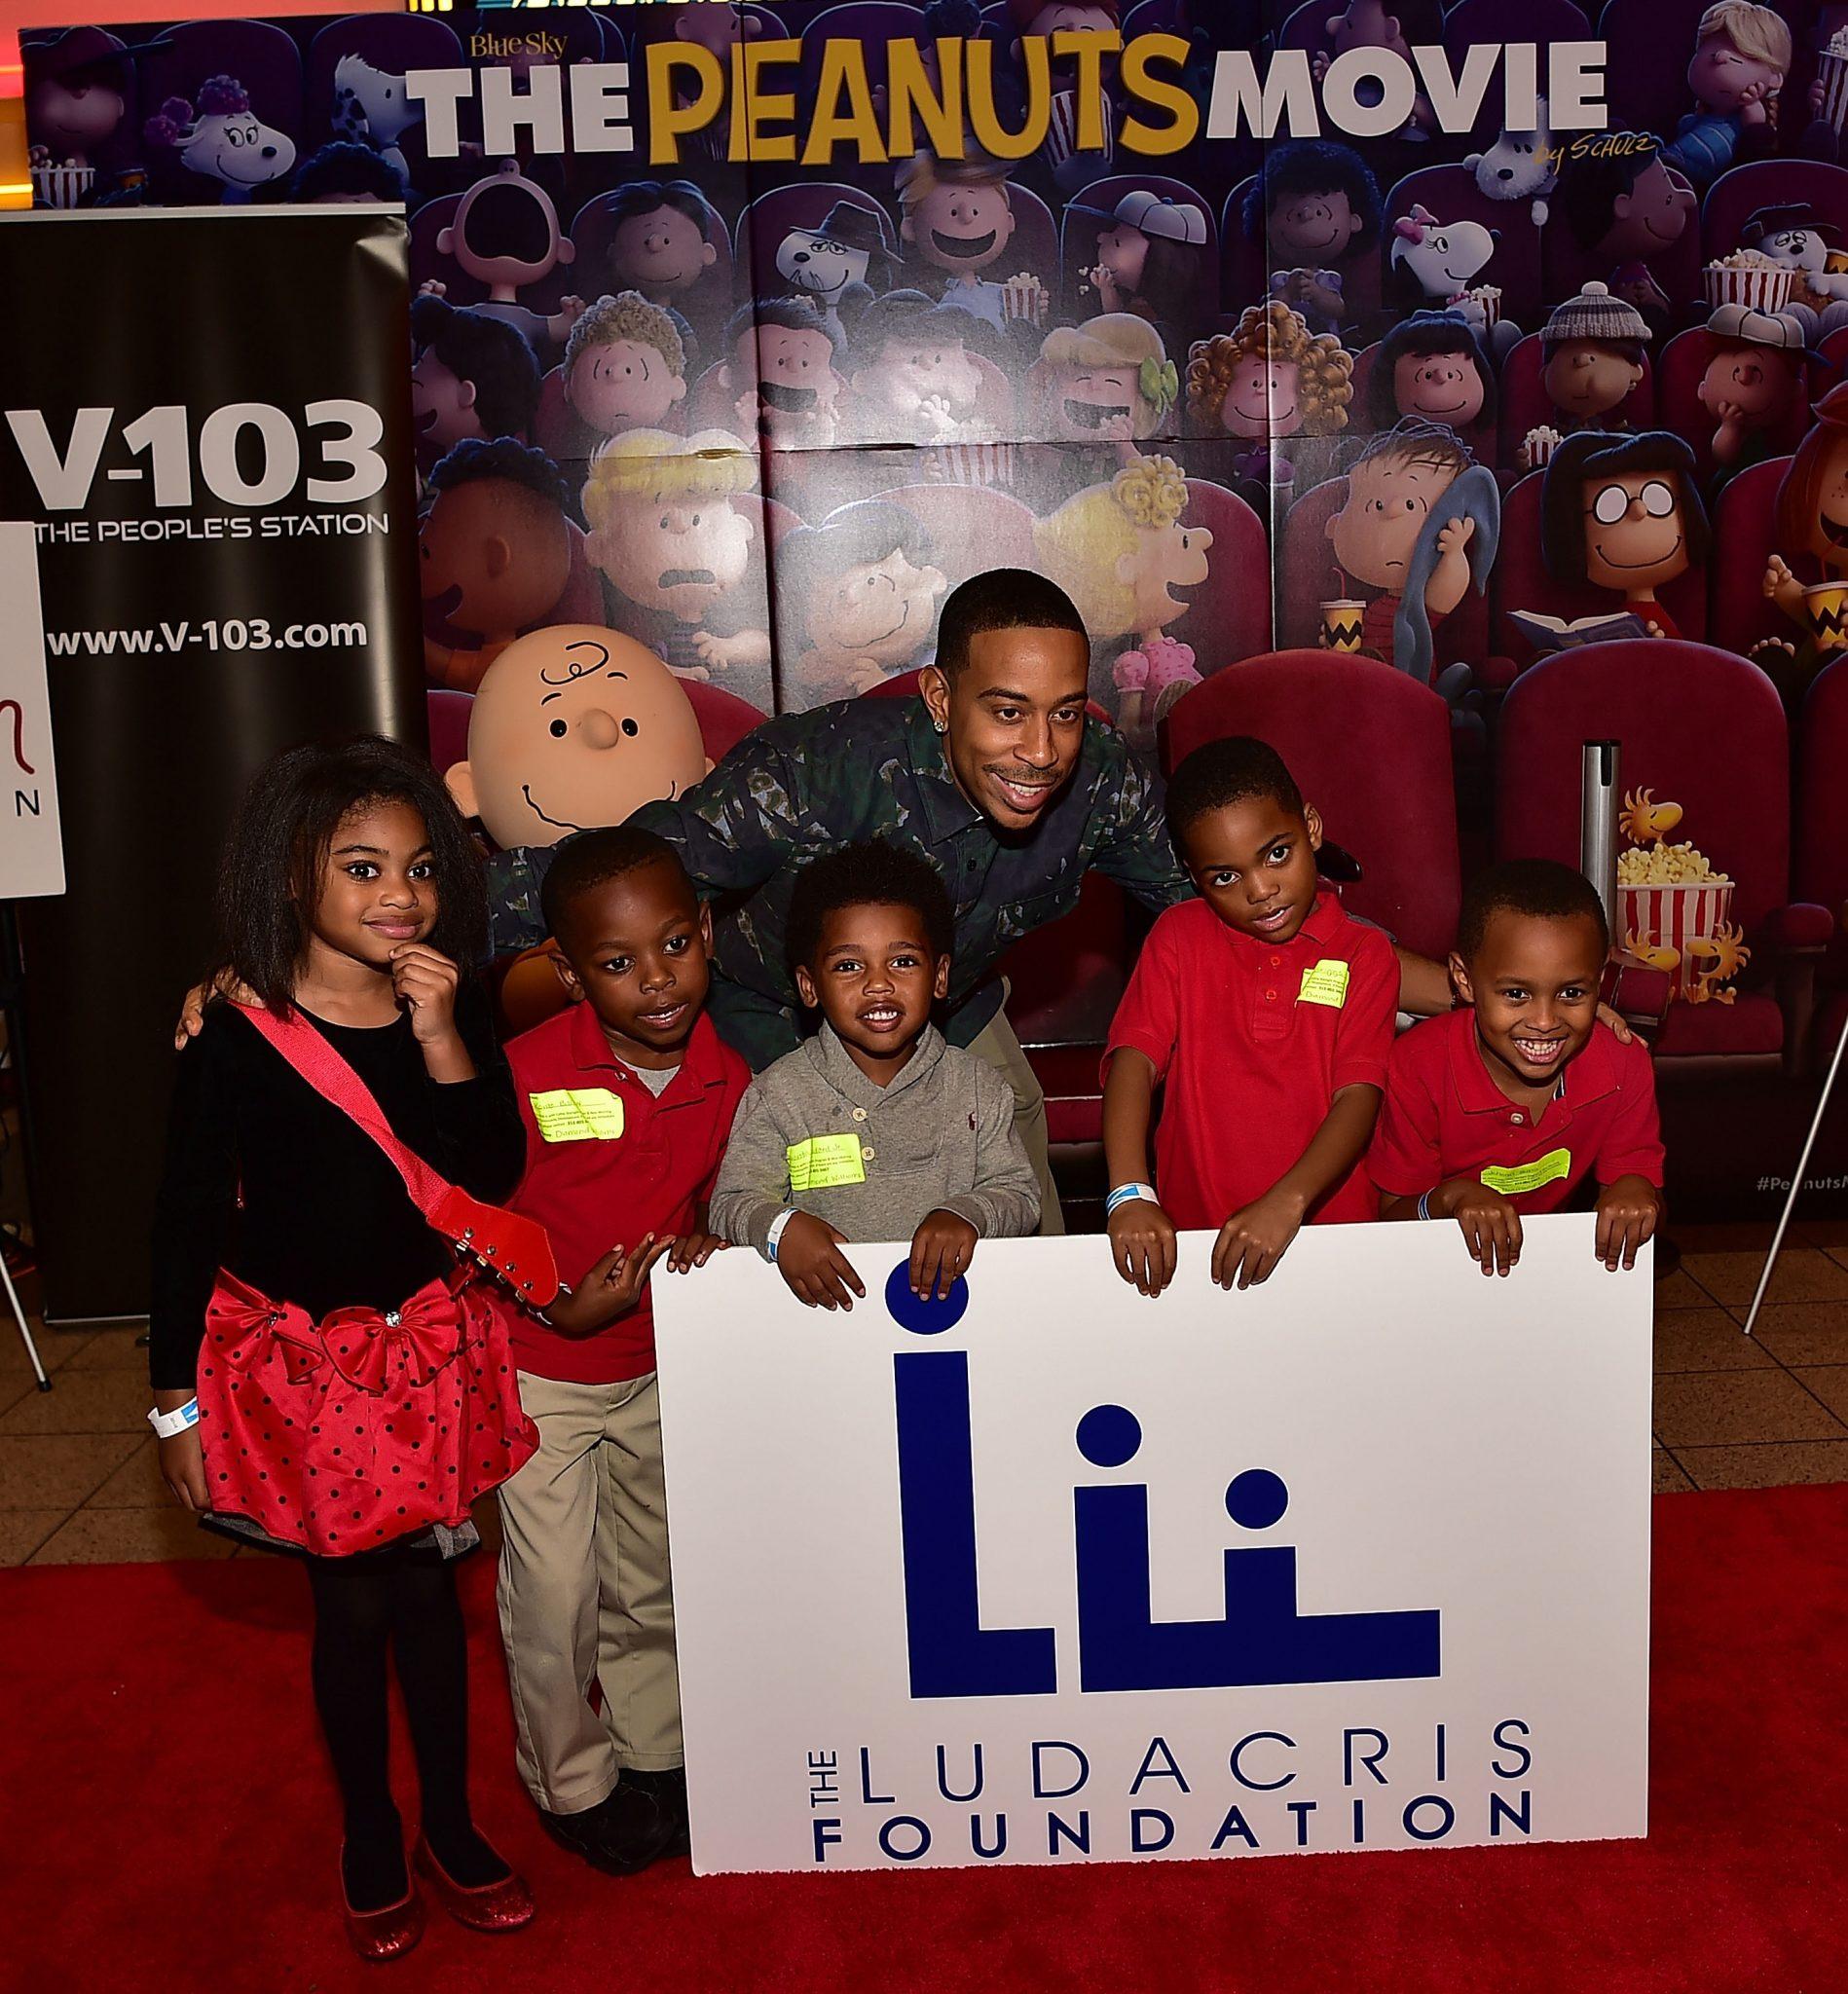 'The Peanuts Movie' VIP Red Carpet With Ludacris & Ryan Cameron Foundations